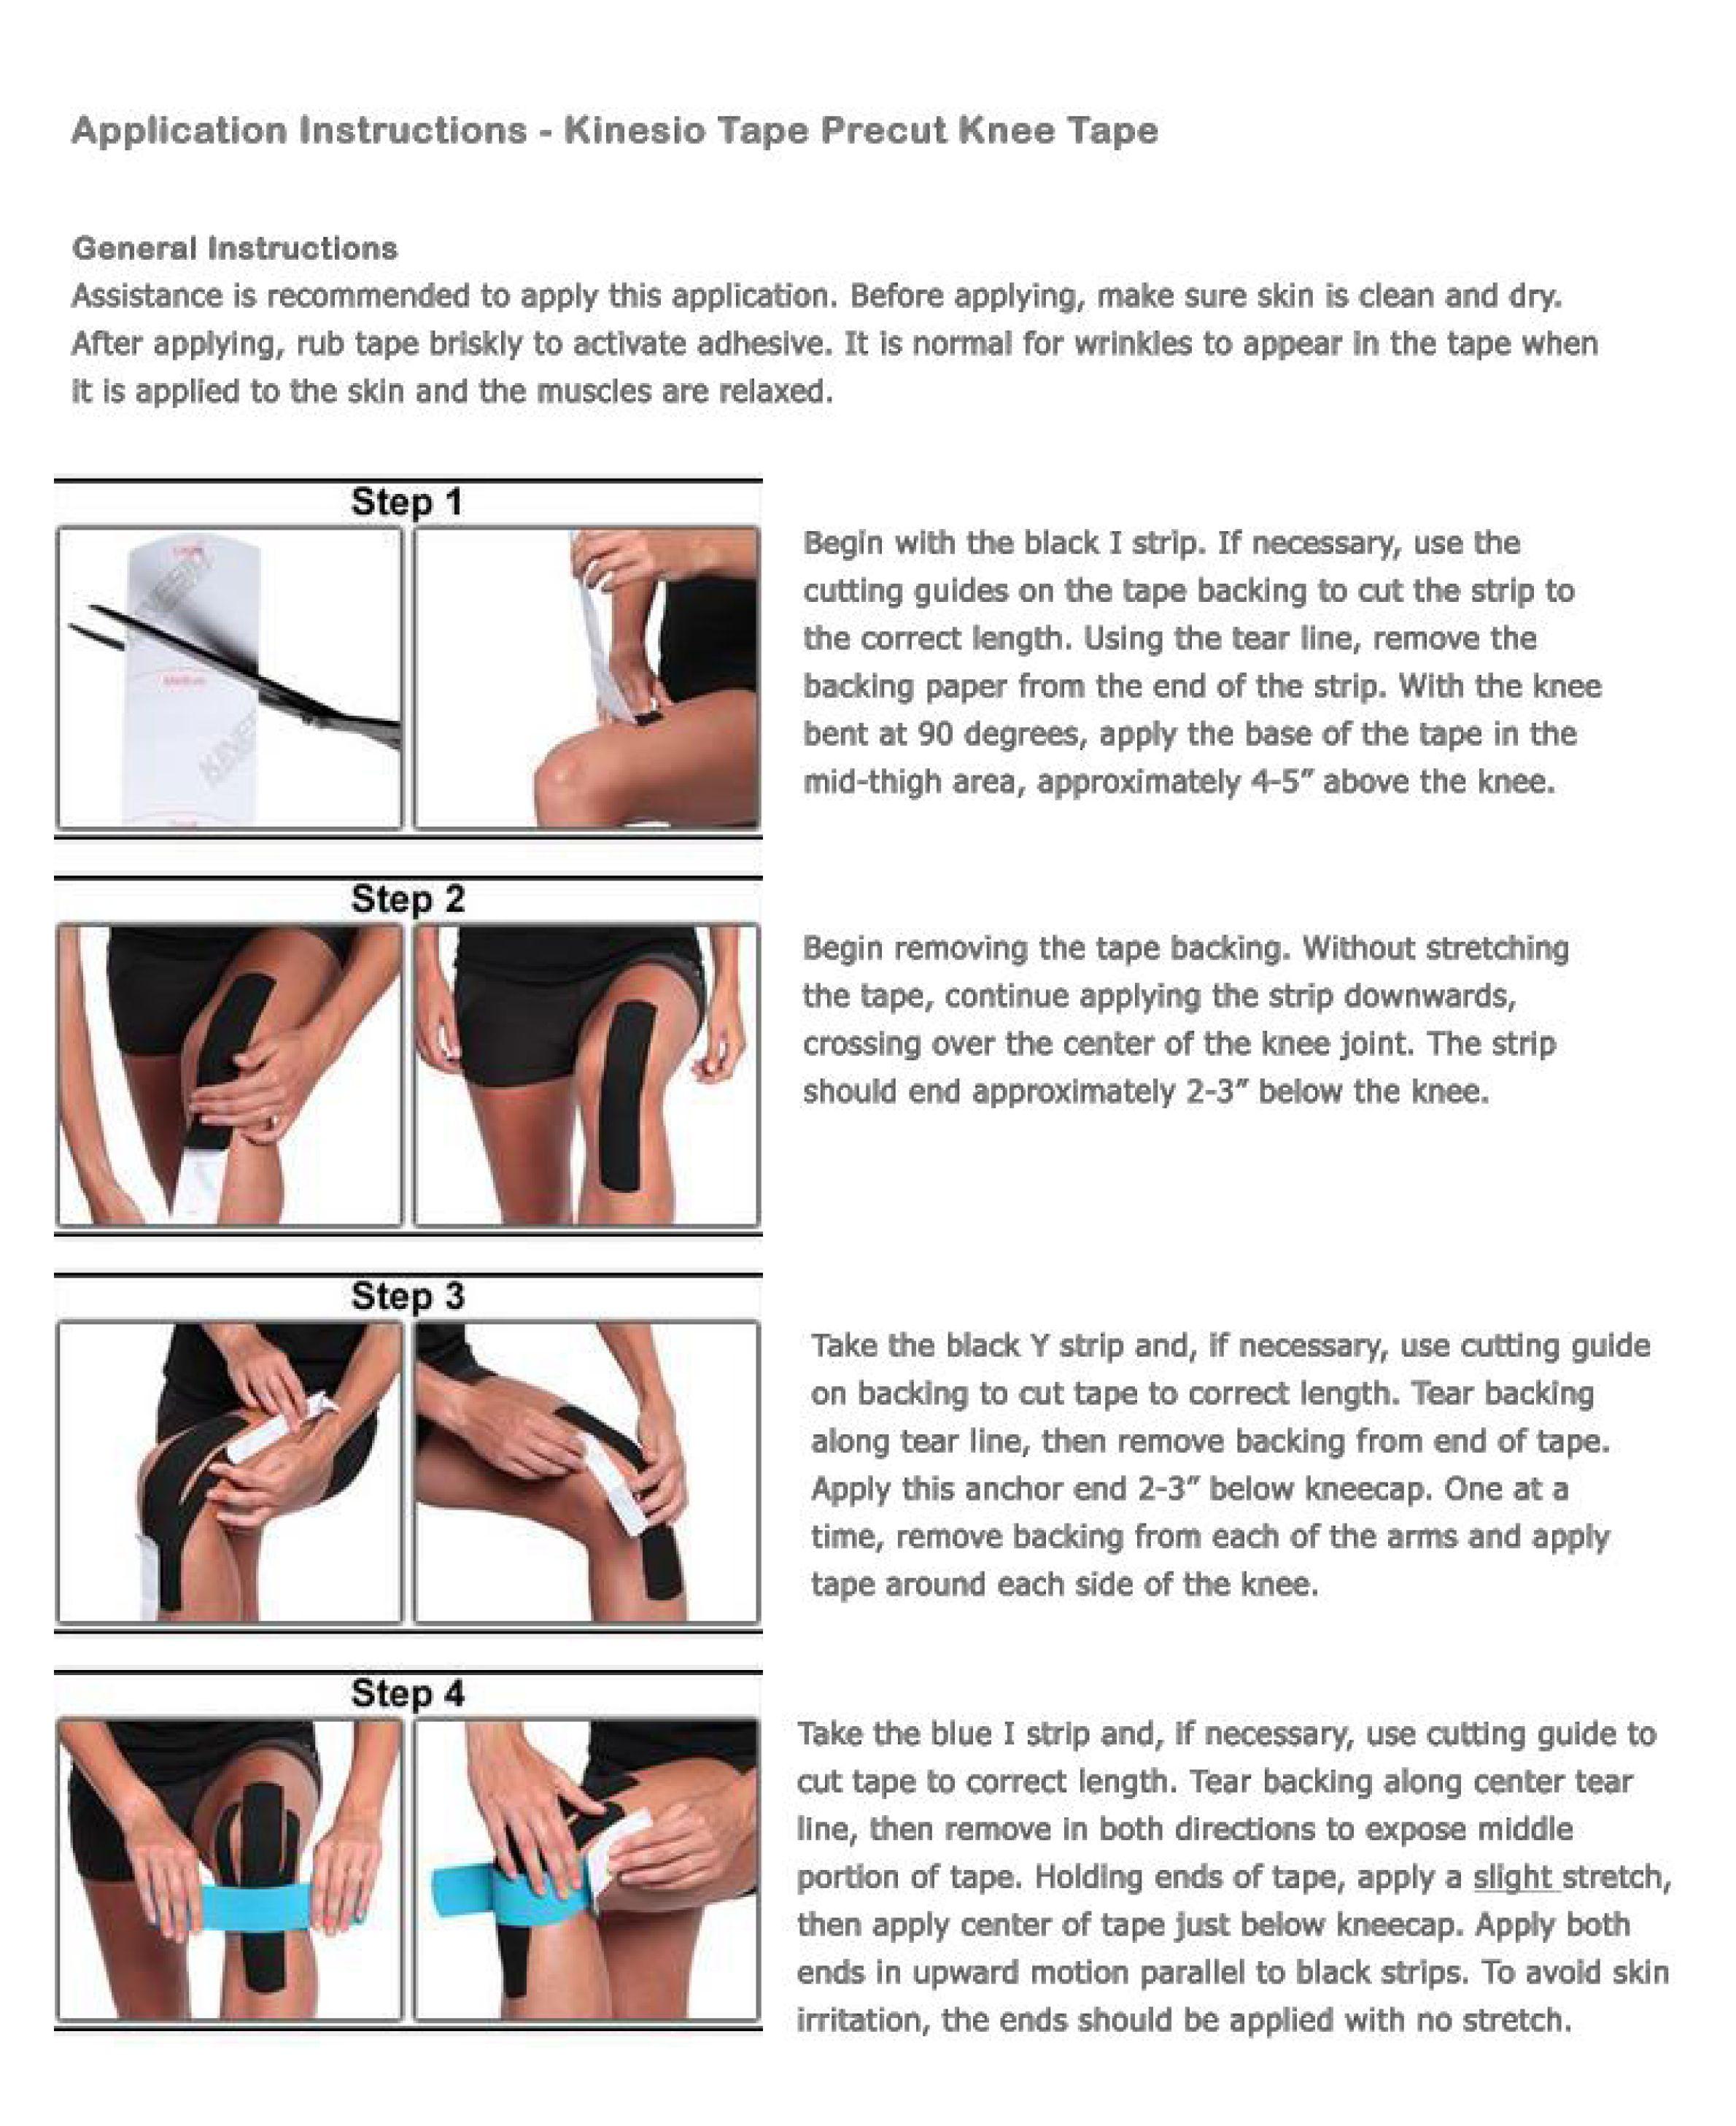 Kinesio instructions for knee precuttape kinesiology